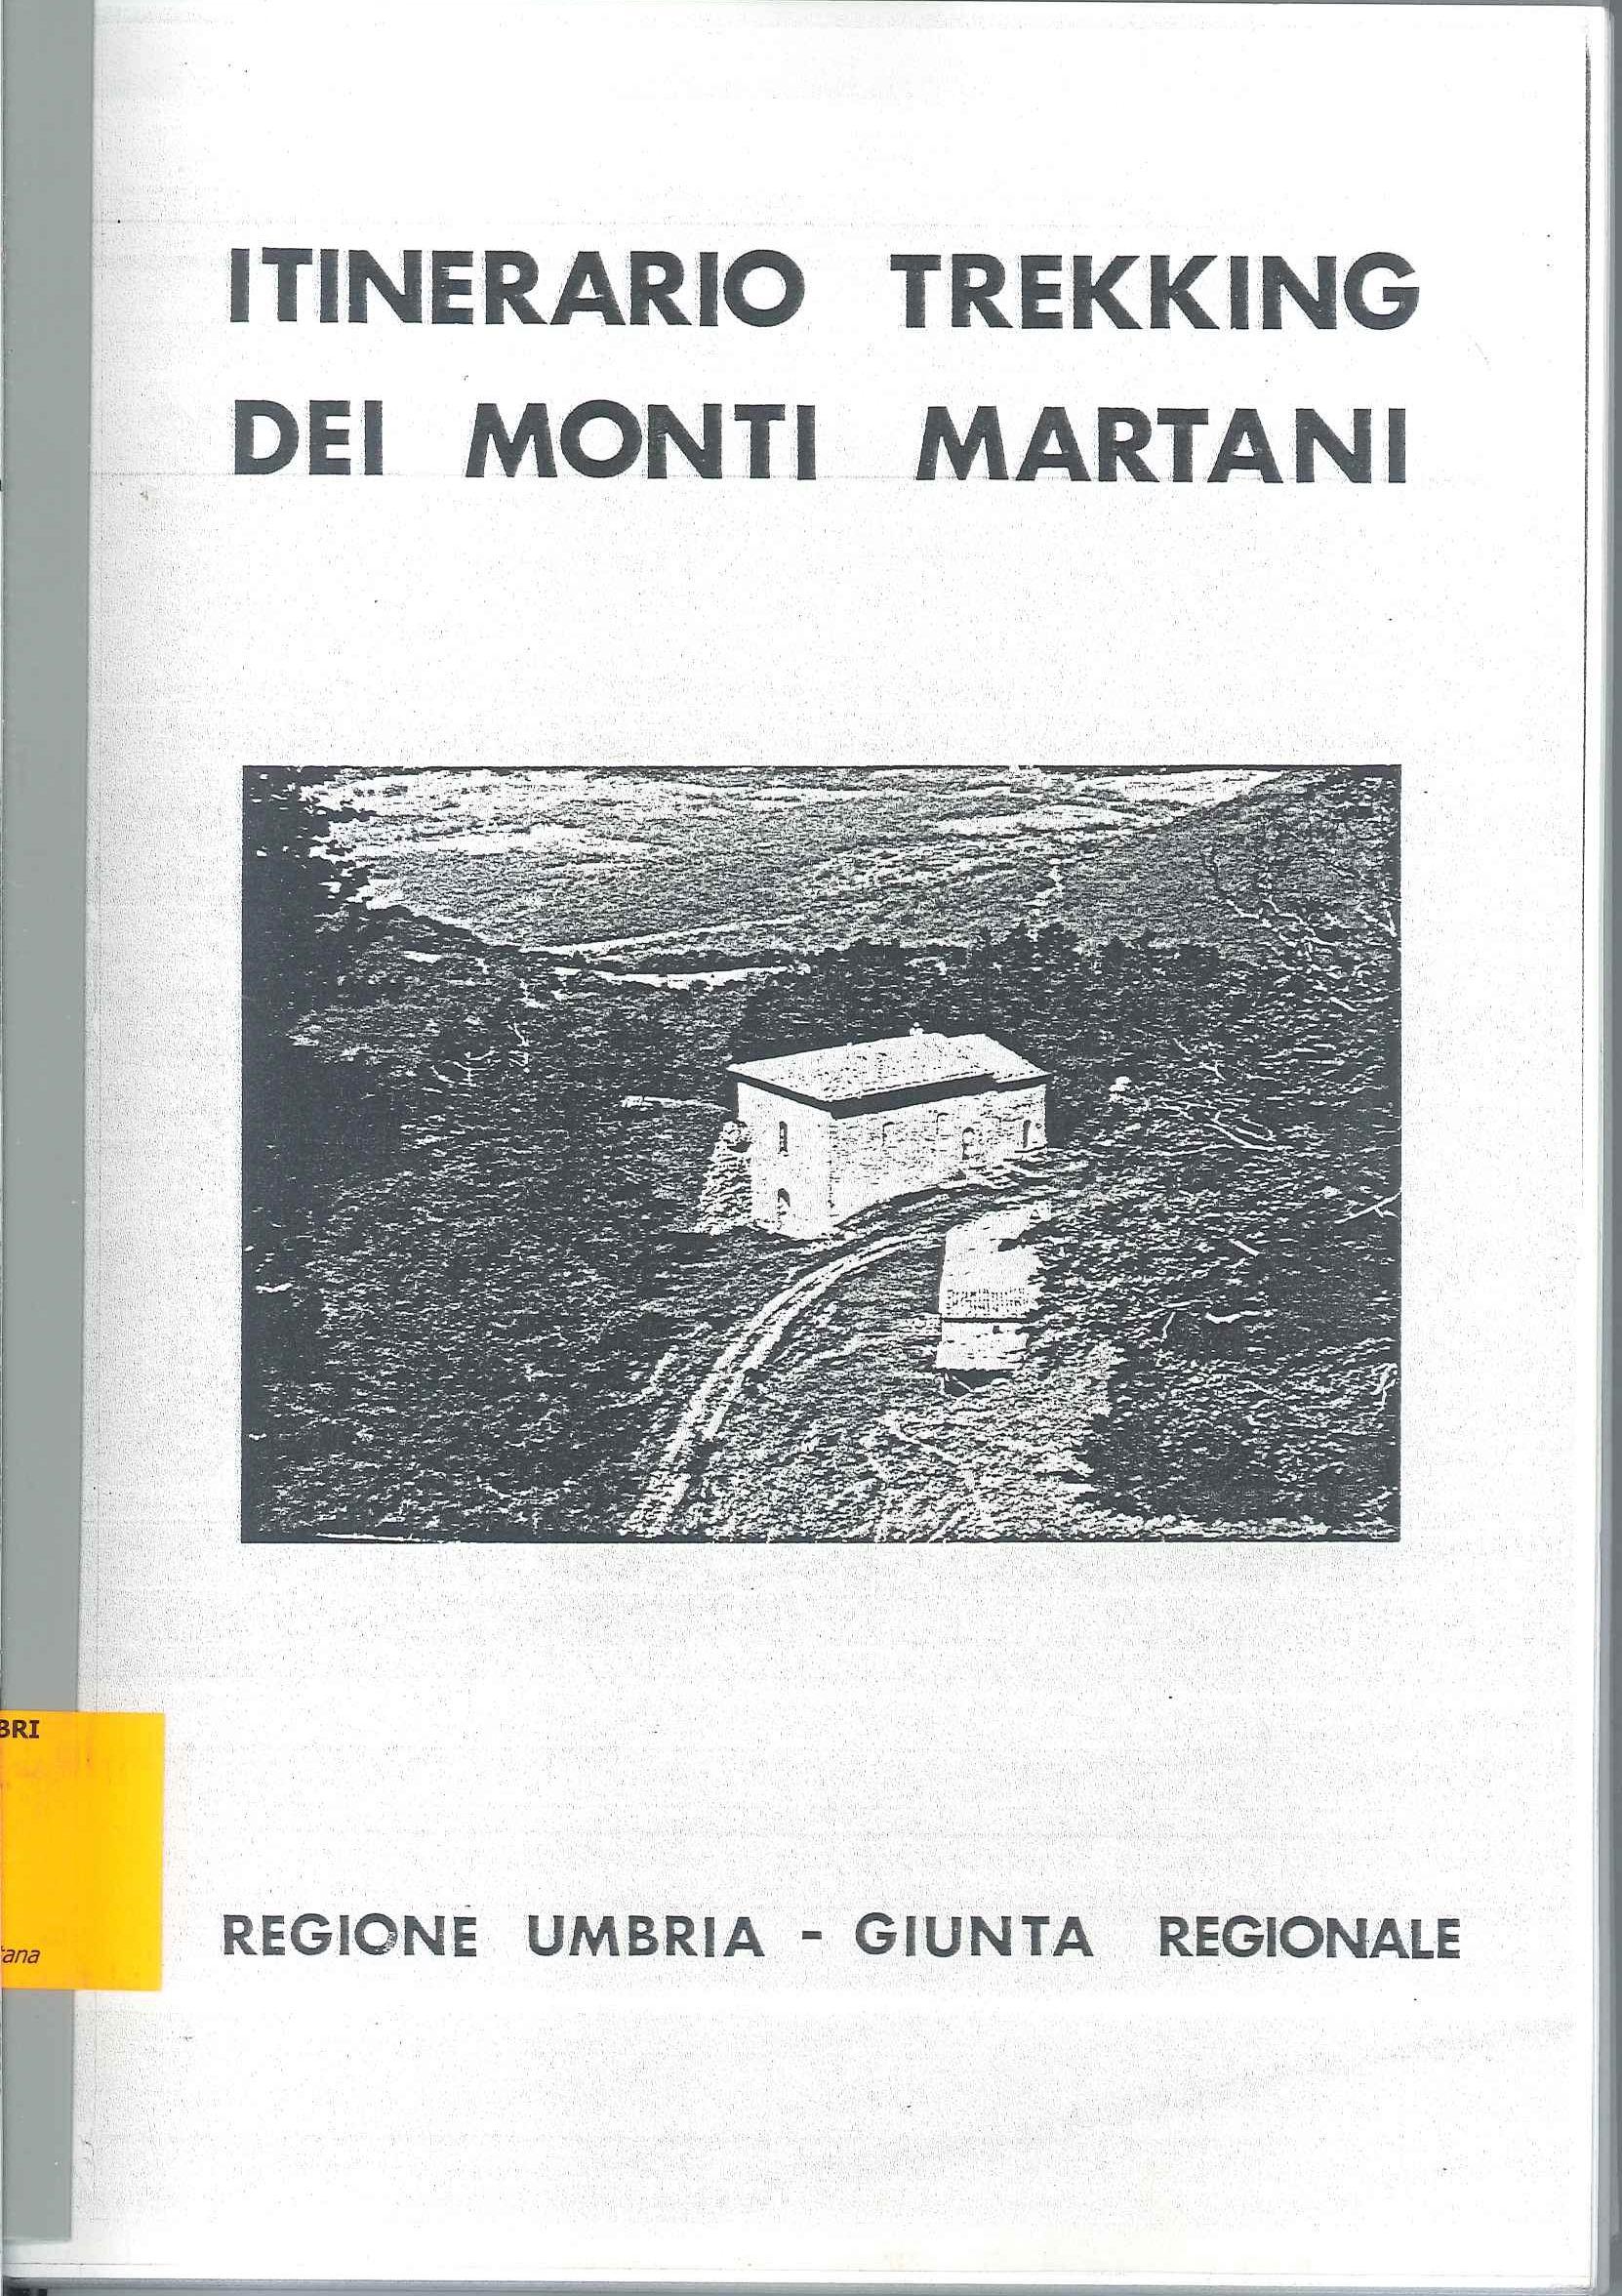 Itinerario Trekking dei Monti Martani